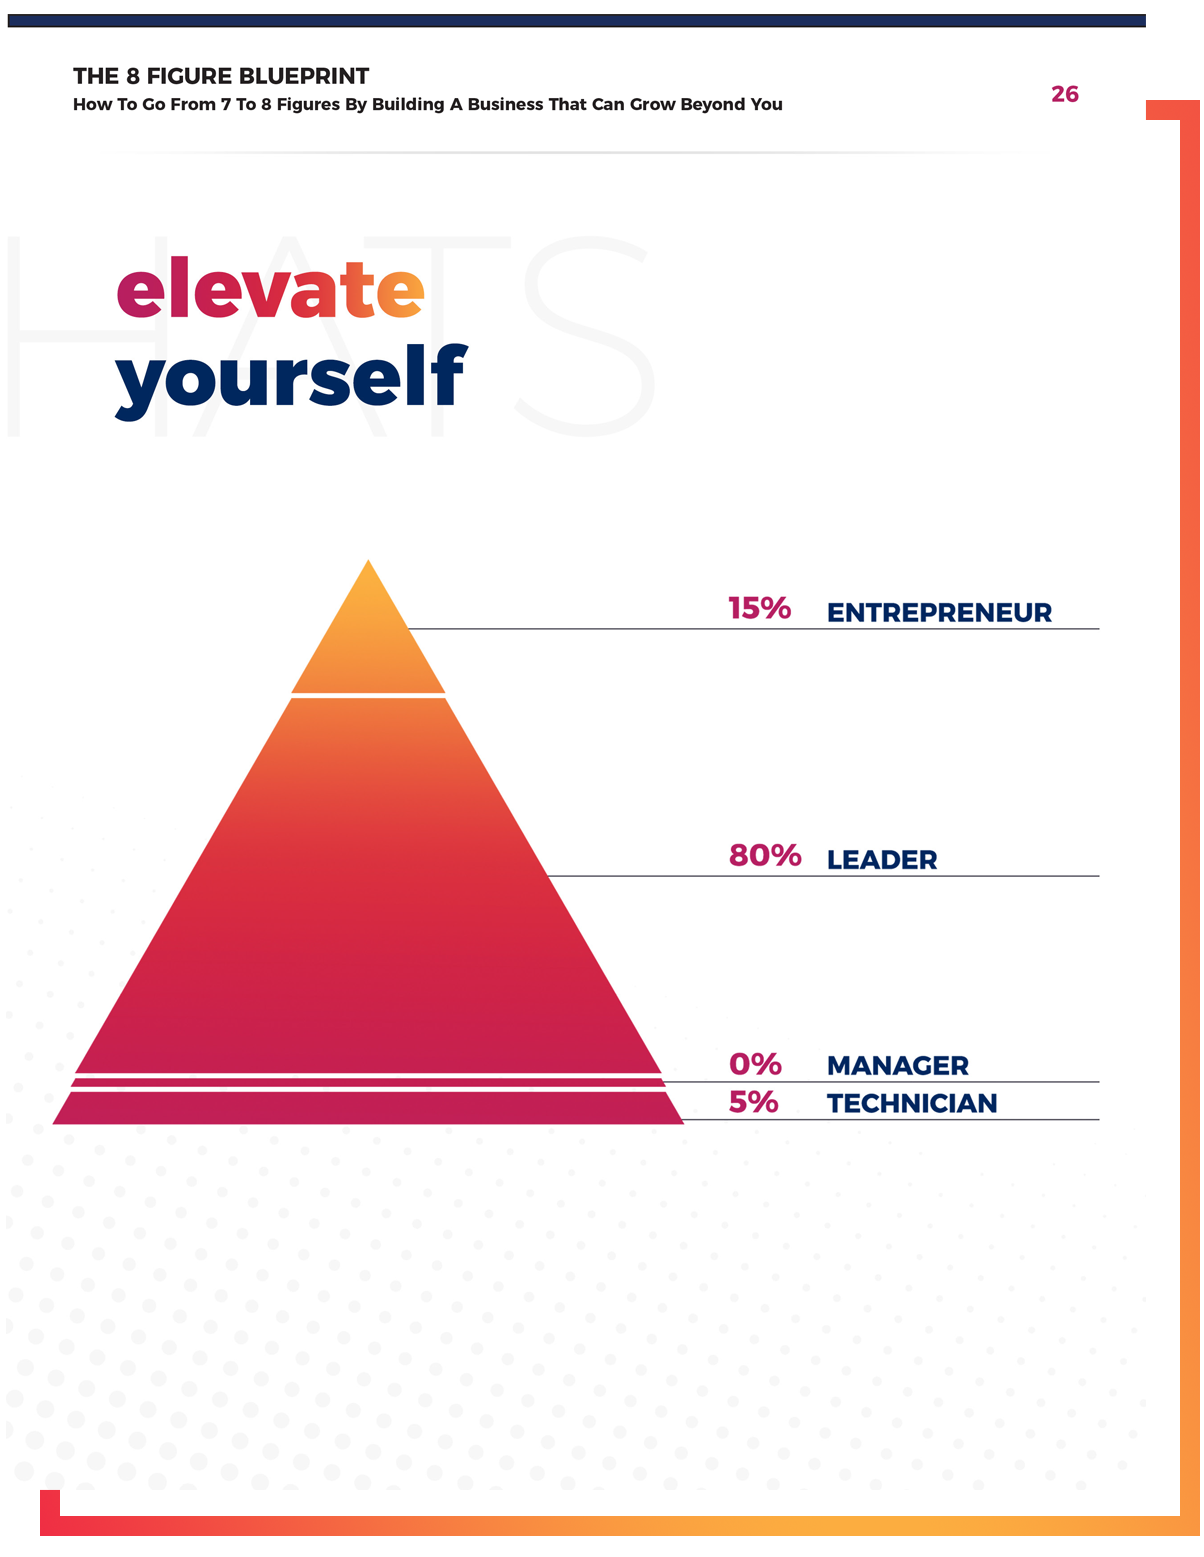 elevate-urself